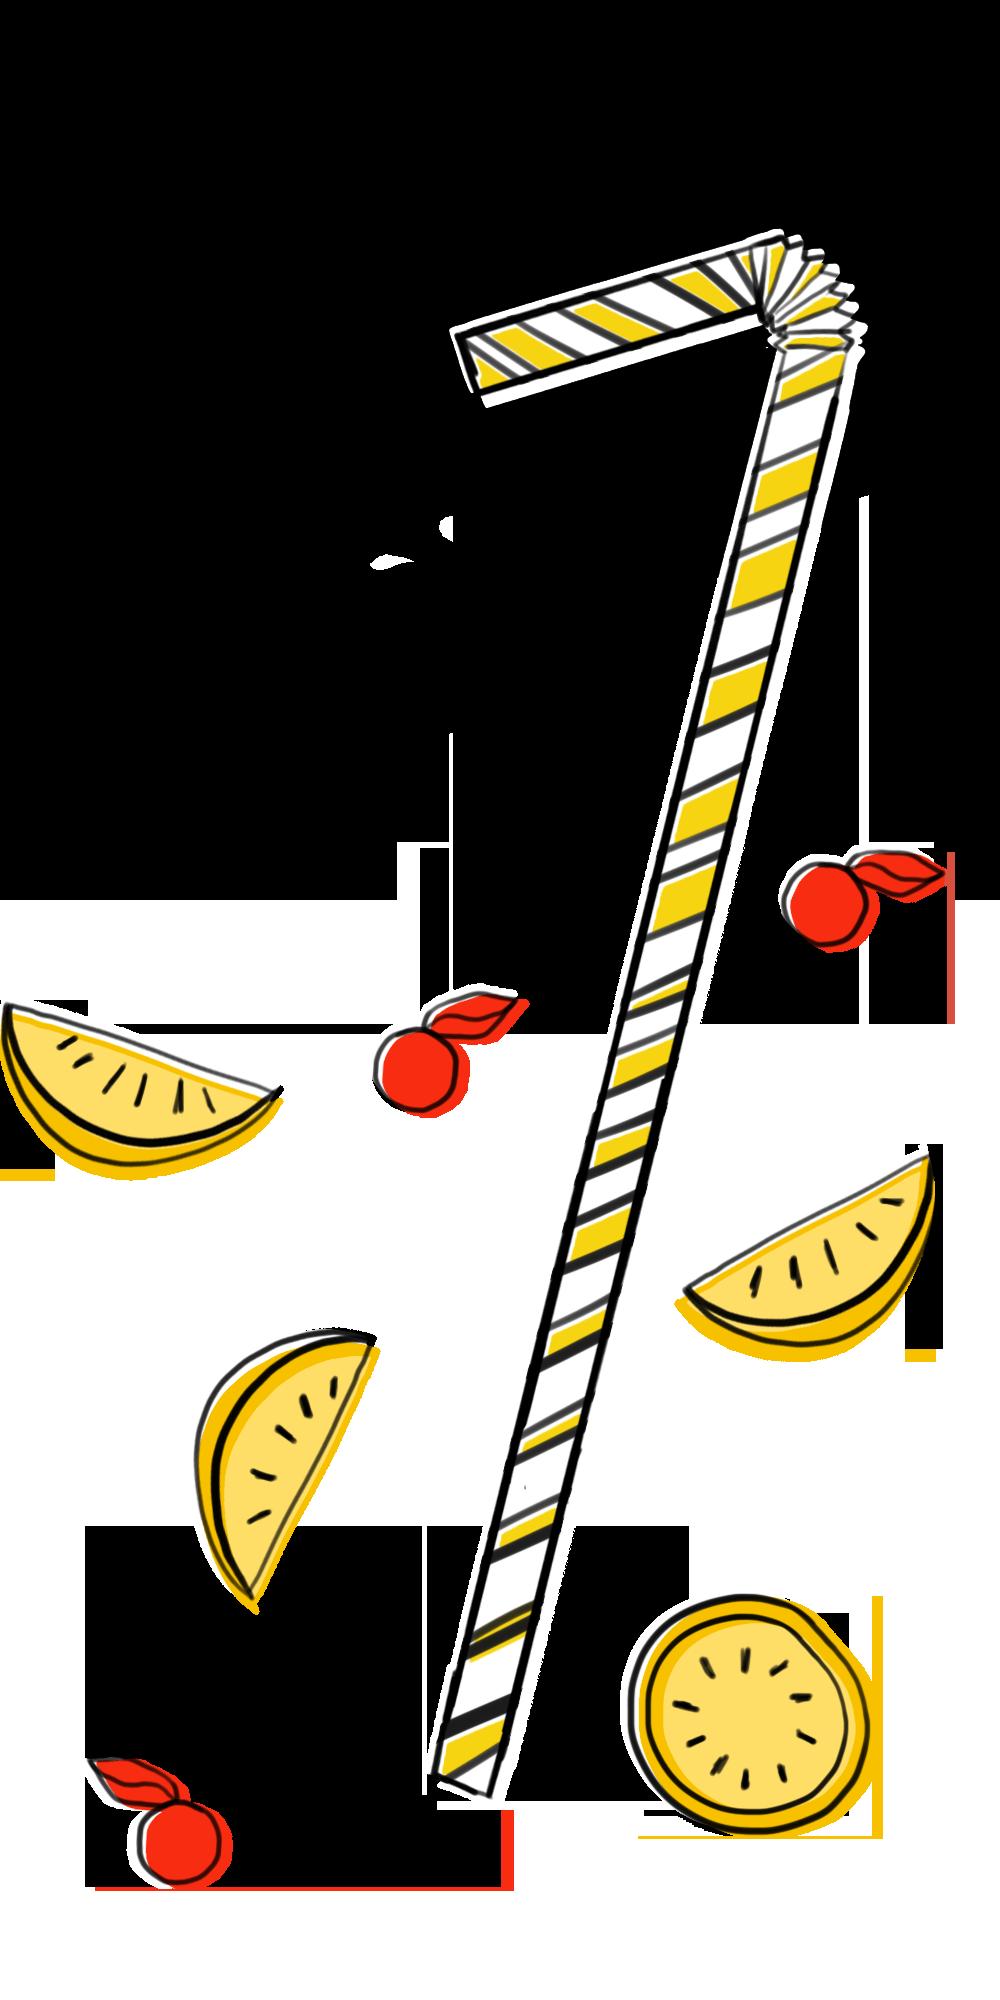 Juice. Casetify iPhone Art Design Illustration Cool